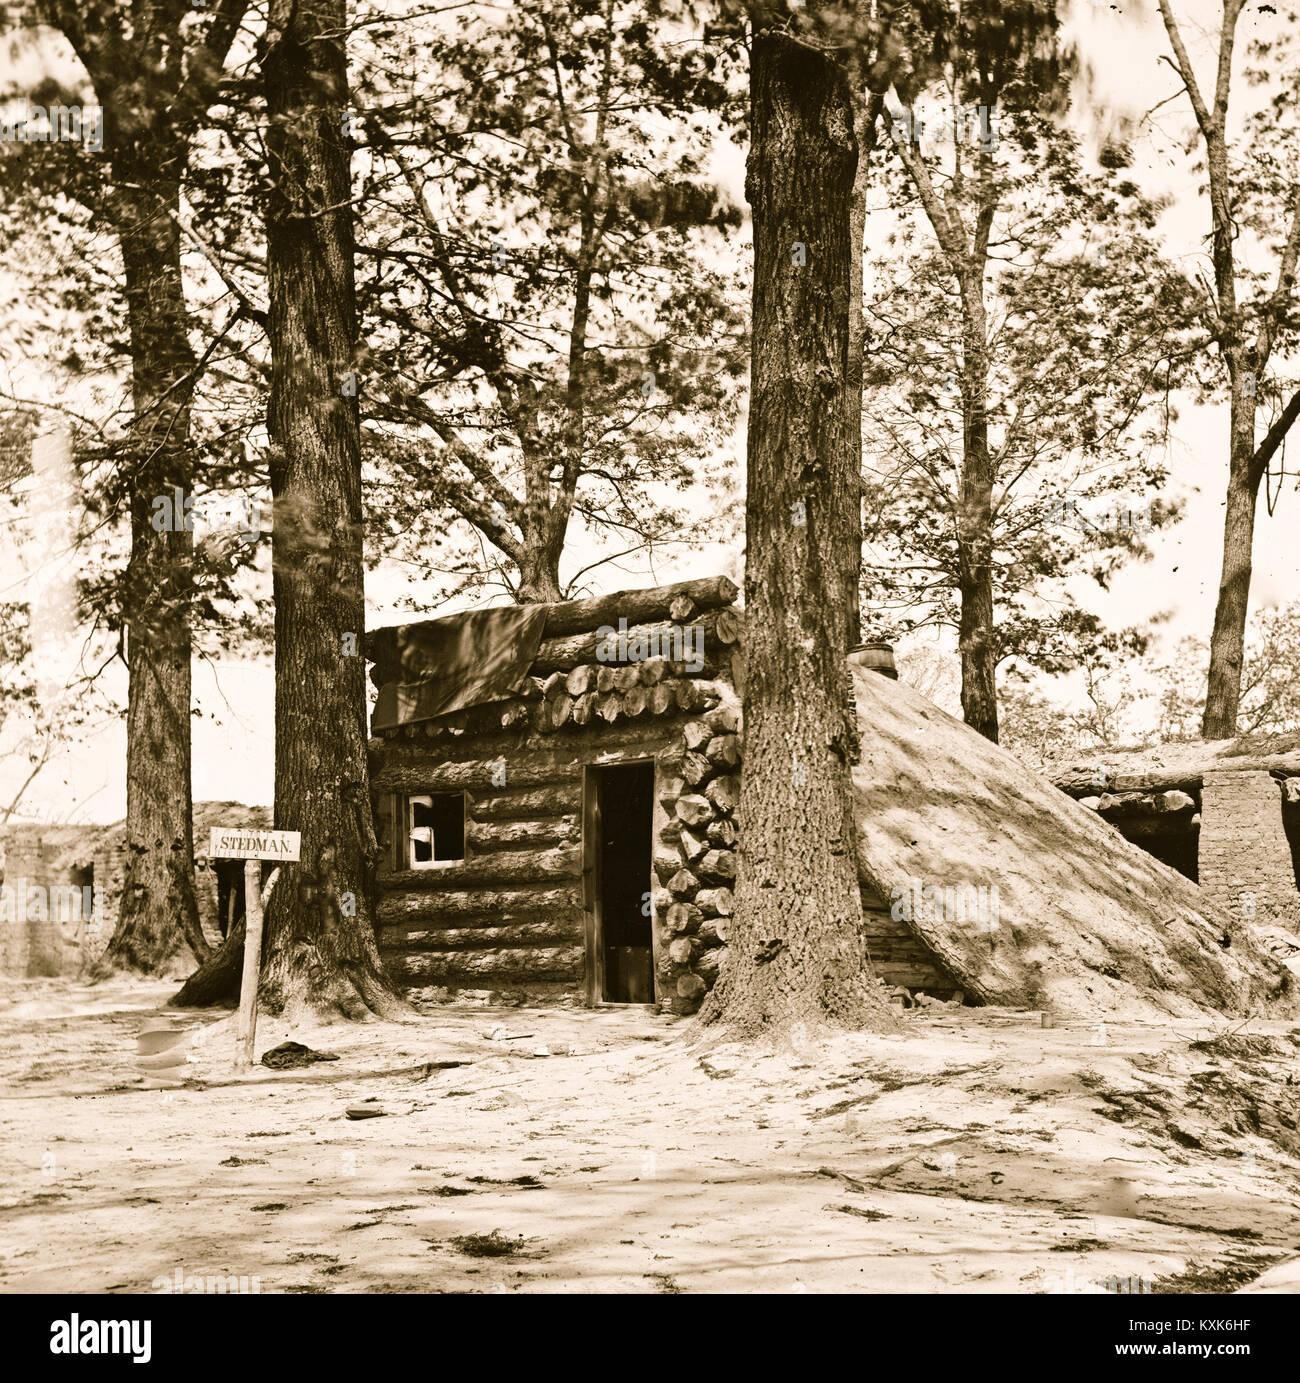 Petersburg, Virginia. Bomb-proof at Fort Stedman - Stock Image